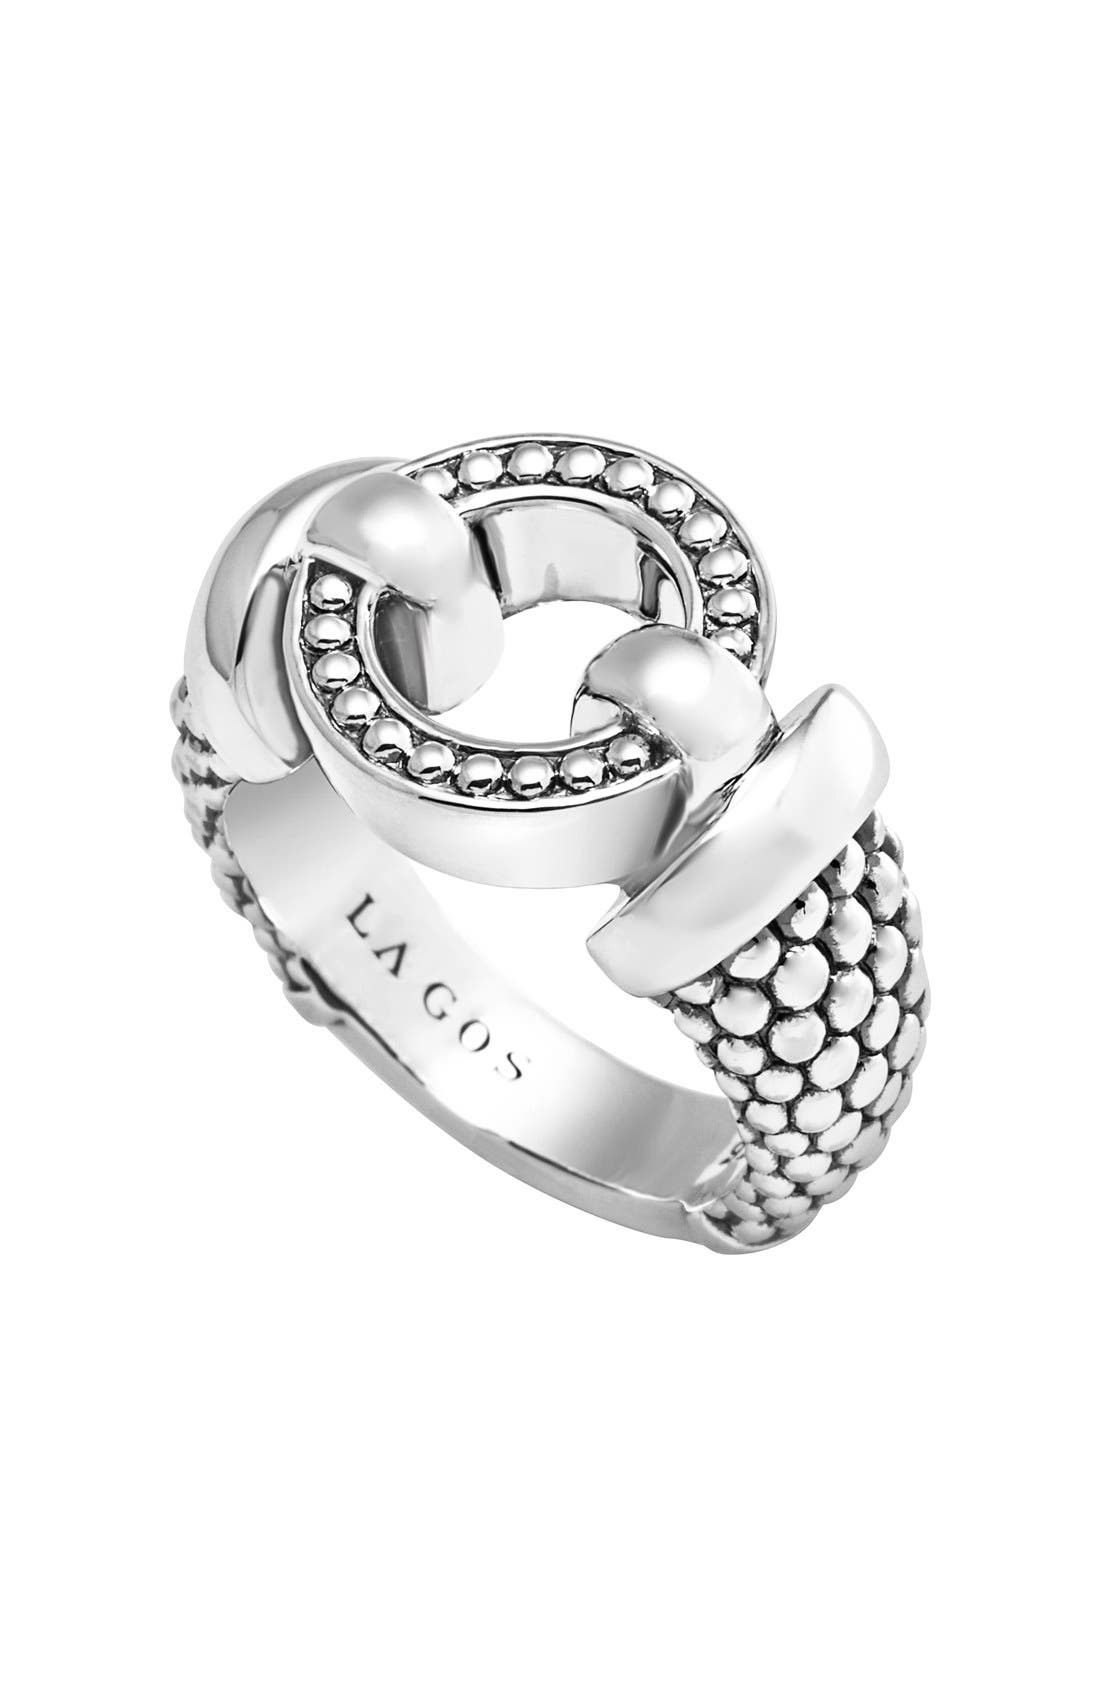 Main Image - Lagos 'Enso' Caviar™ Ring